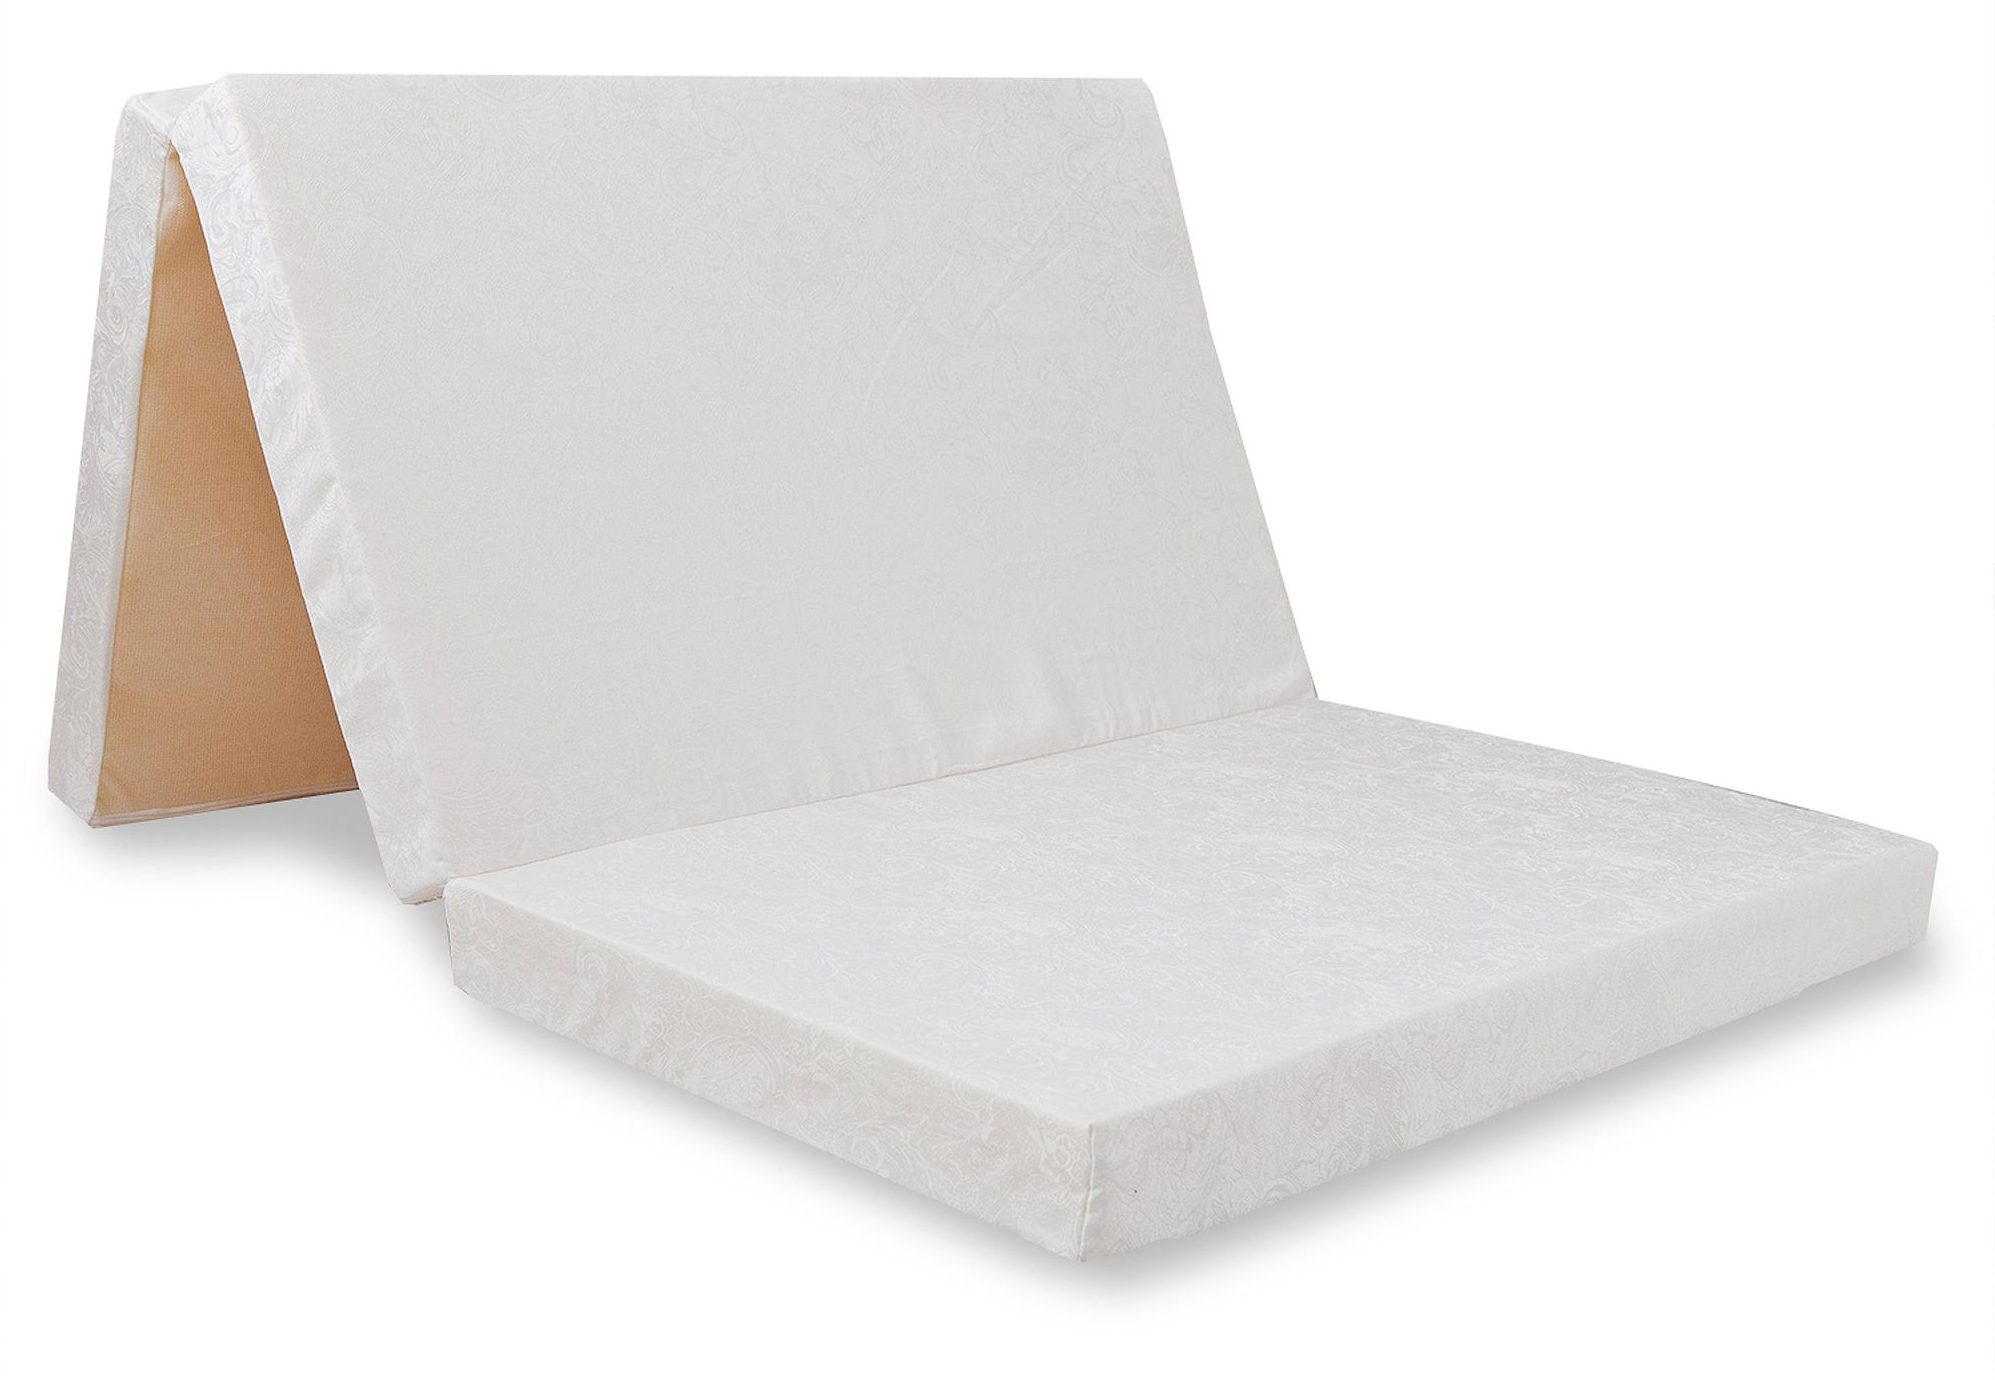 Colch n plegable para imprevistos - Colchon para cama plegable ...